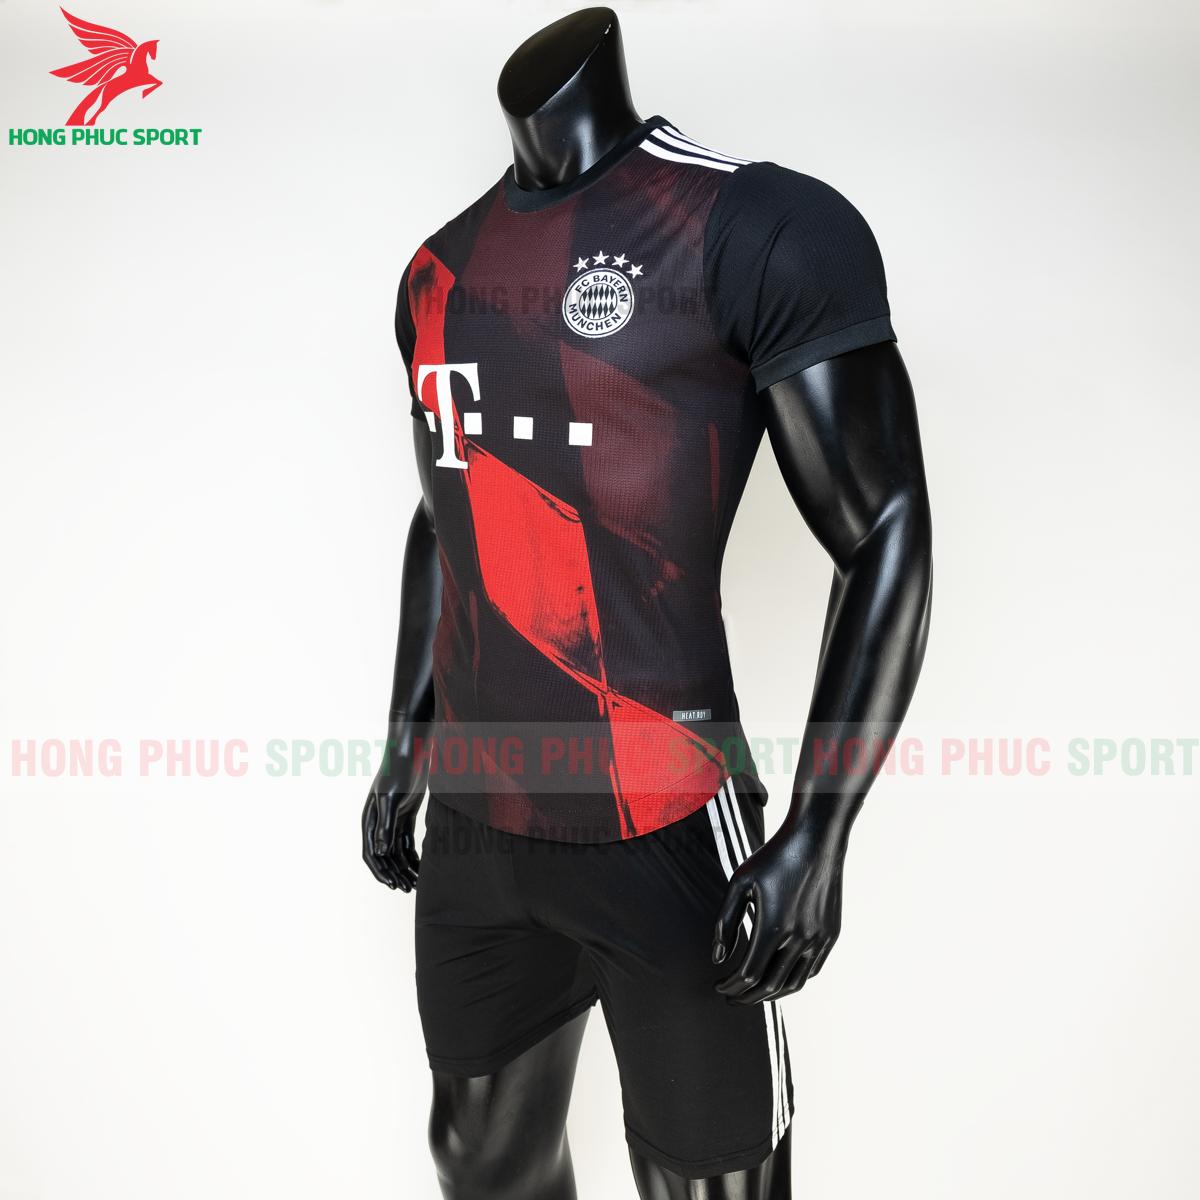 https://cdn.hongphucsport.com/unsafe/s4.shopbay.vn/files/285/ao-bayern-munich-20-21-mau-thu-3-hang-thailand-6-5fa0c44c77683.png